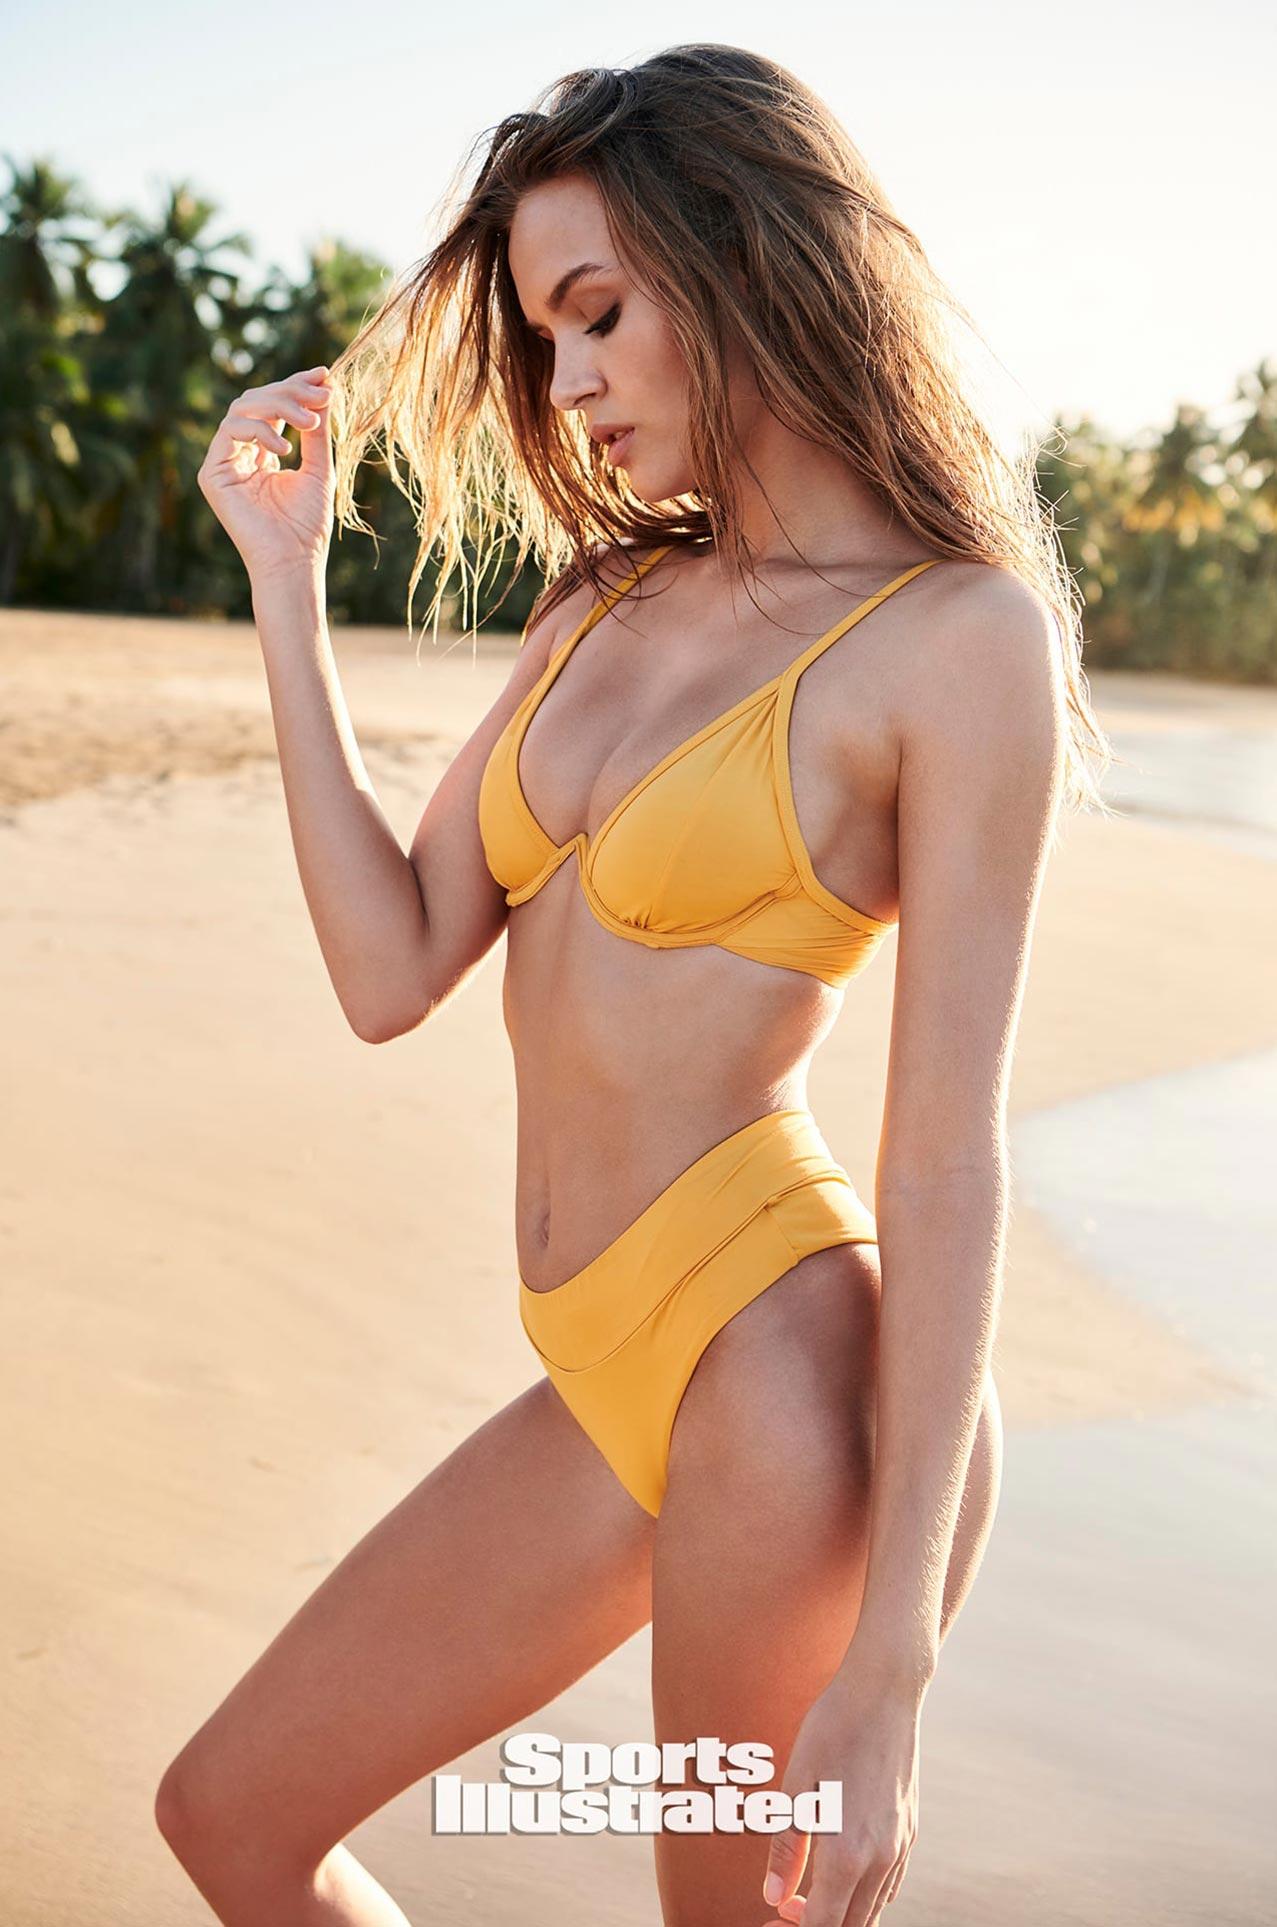 Жозефин Скривер в каталоге купальников Sports Illustrated Swimsuit 2020 / фото 12